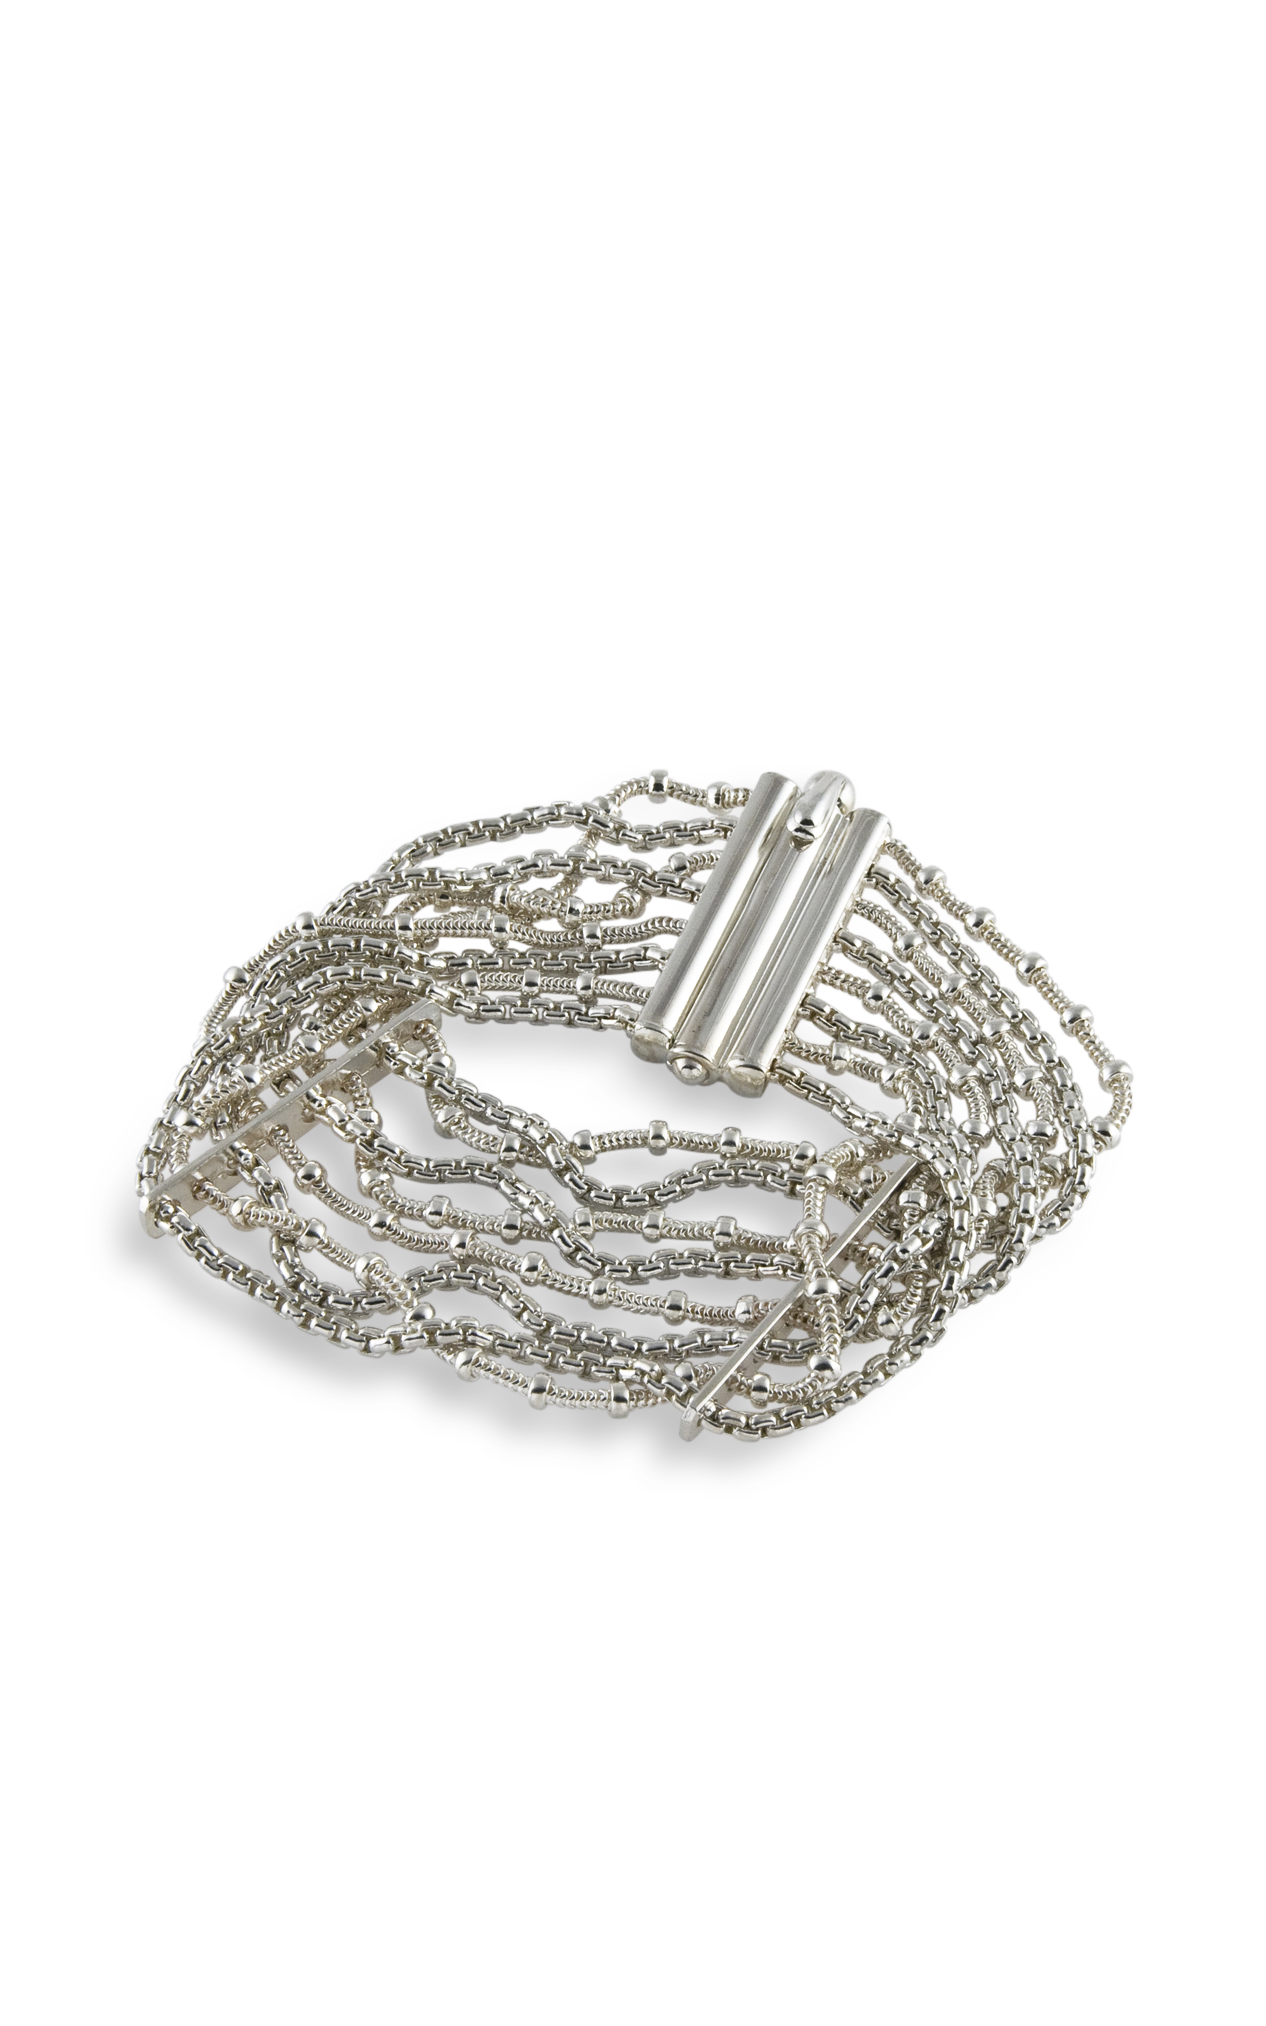 Zina Contemporary Bracelet A892-7 product image